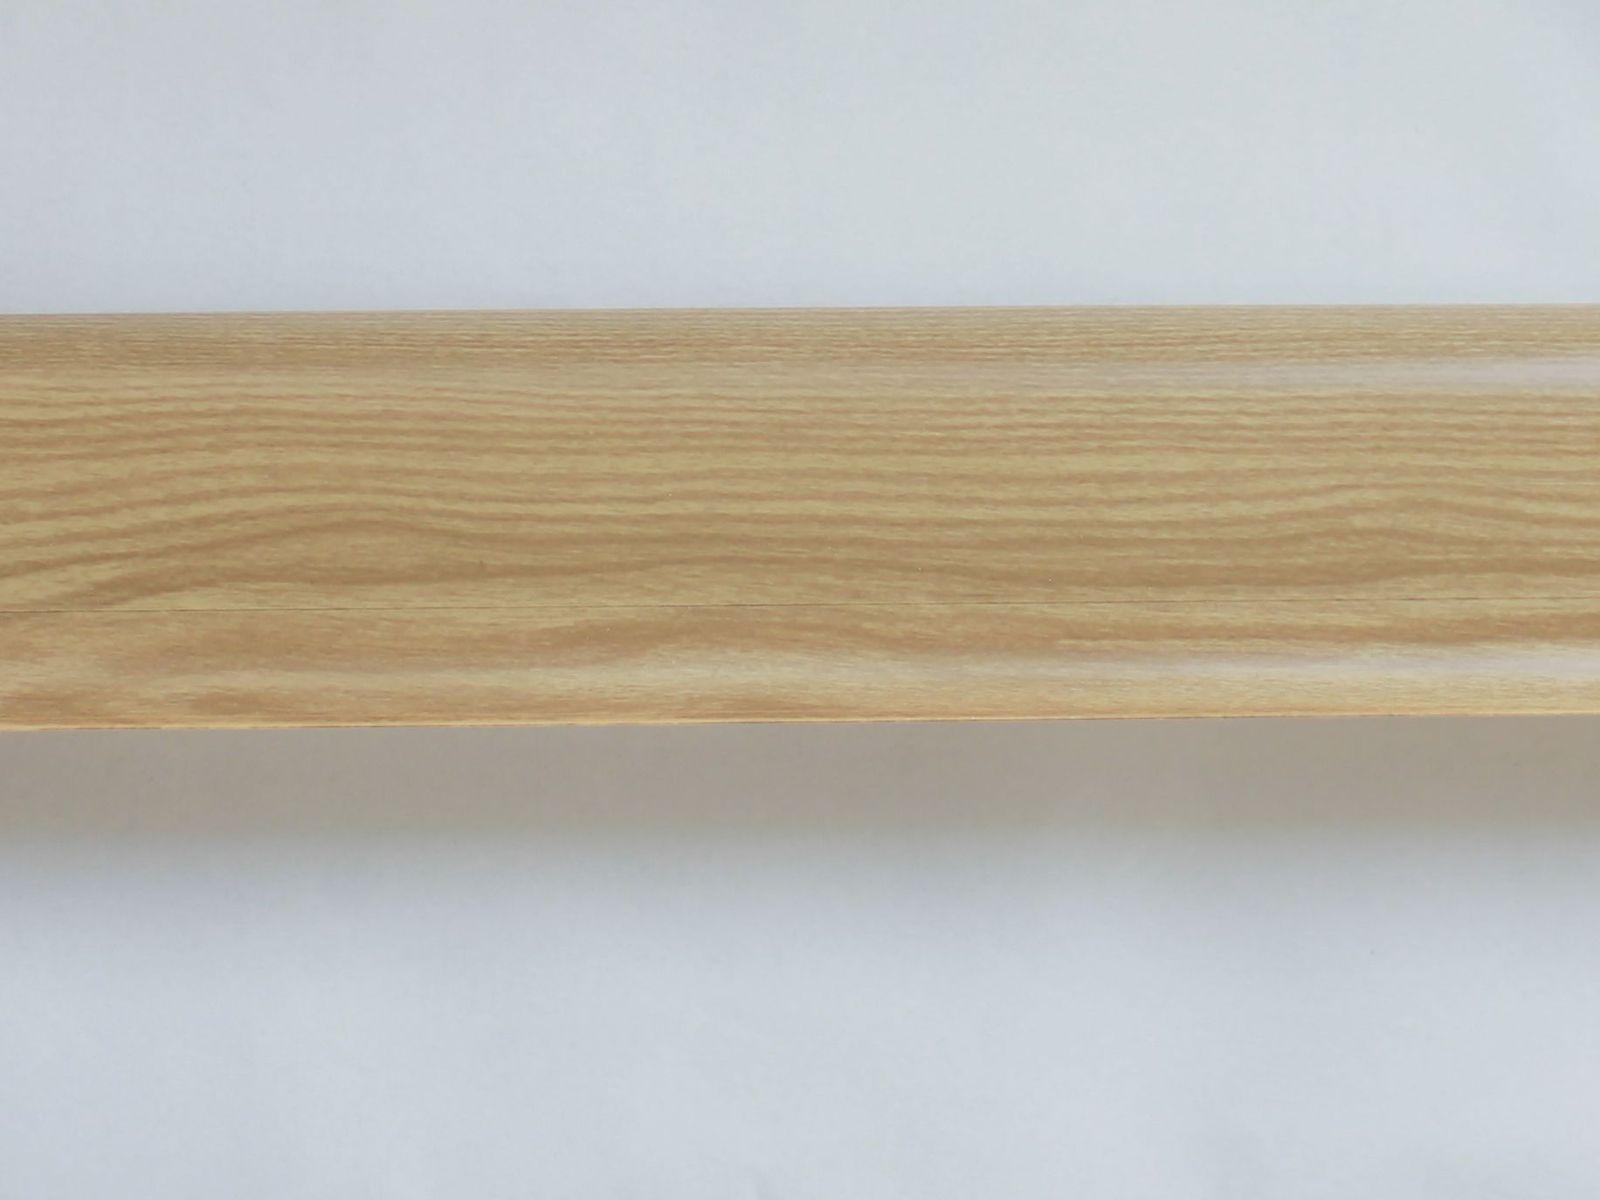 Soklová lišta PVC, SALAG NGF 56 mm, Dekor jilm